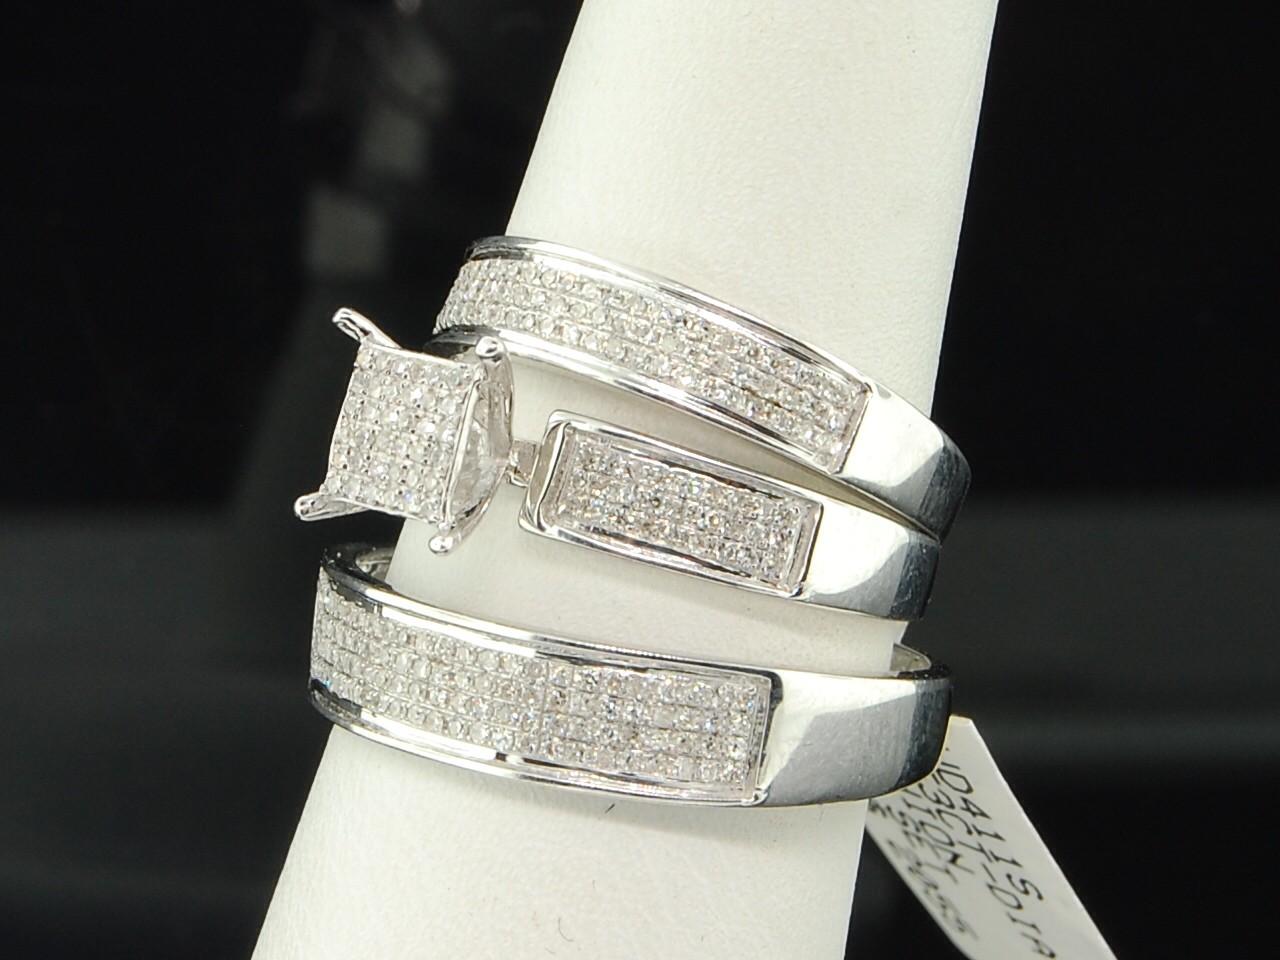 MENS LADIES 10K WHITE GOLD DIAMOND ENGAGEMENT RING PAVE WEDDING BAND